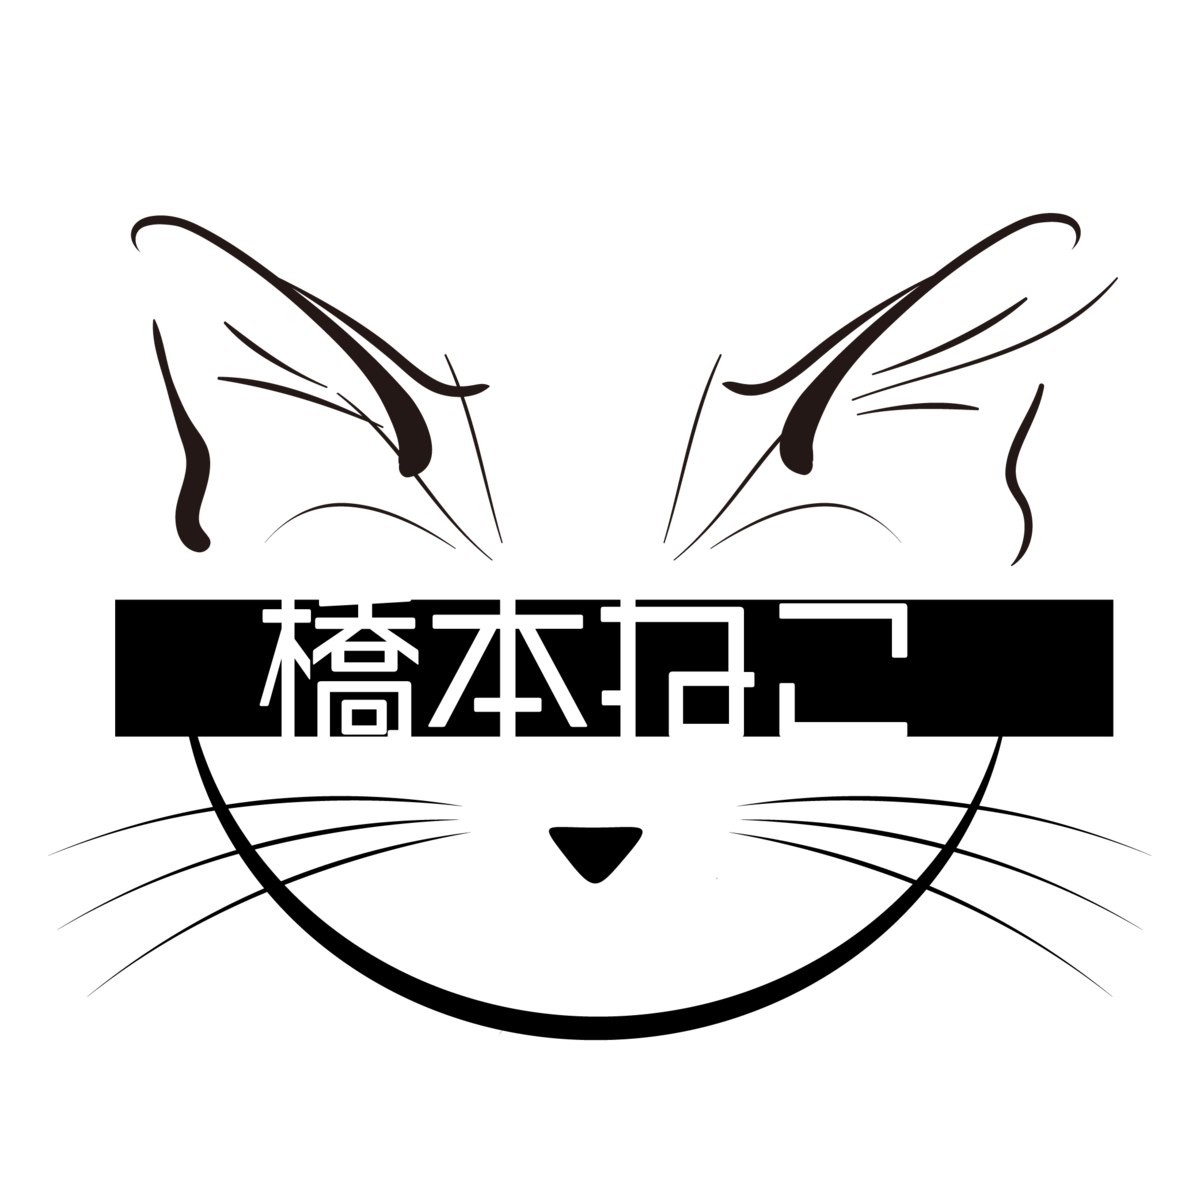 f:id:hashimoto_neko:20200415024555p:plain